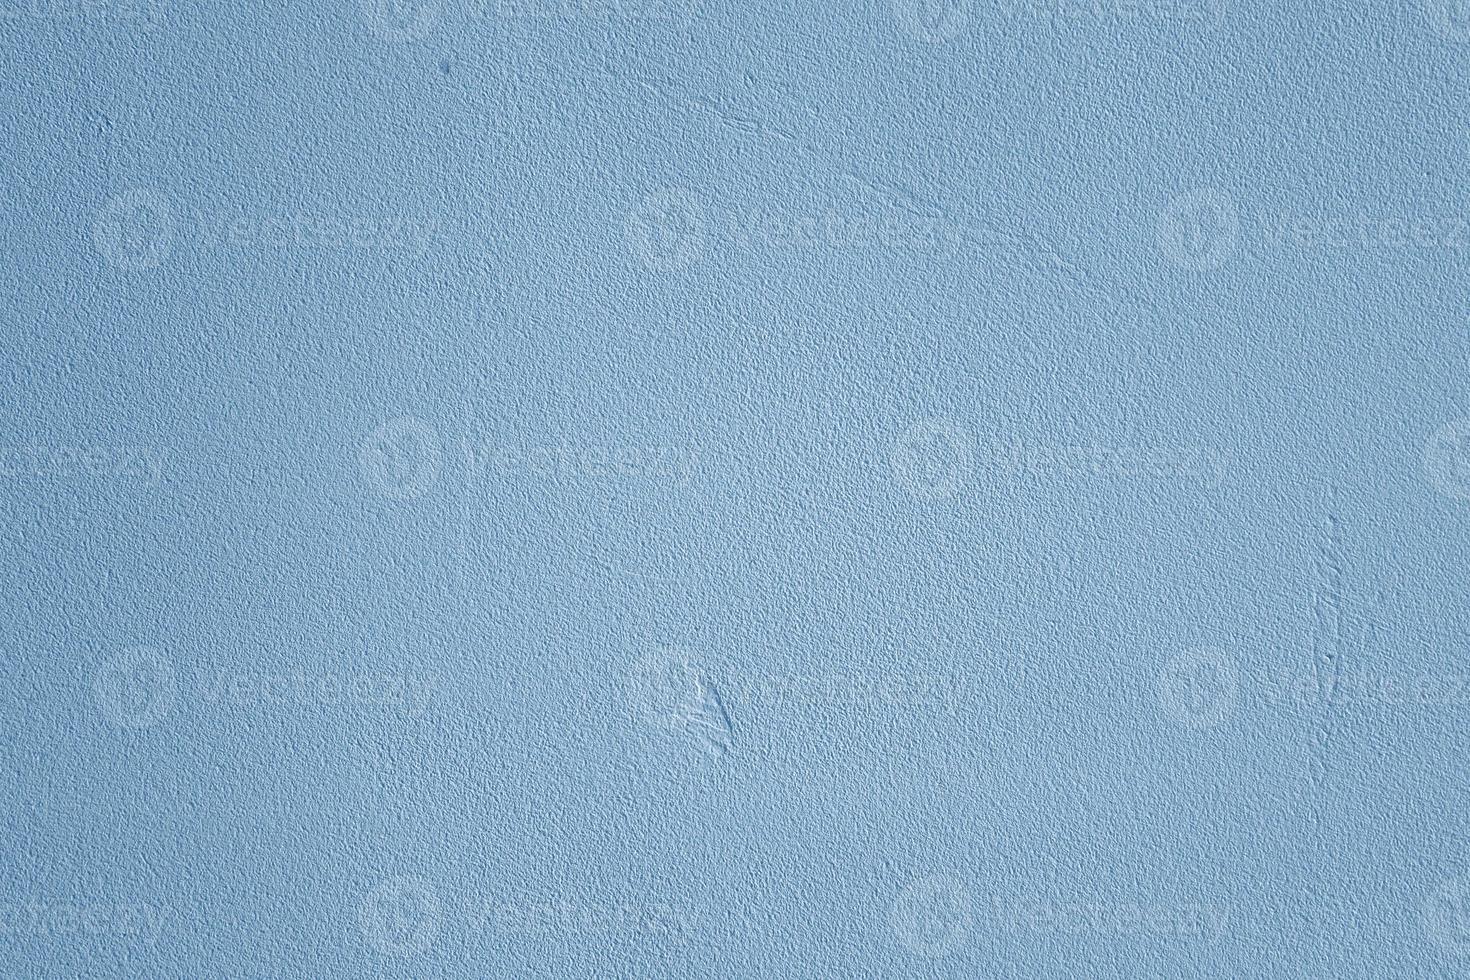 fondo texturizado foto